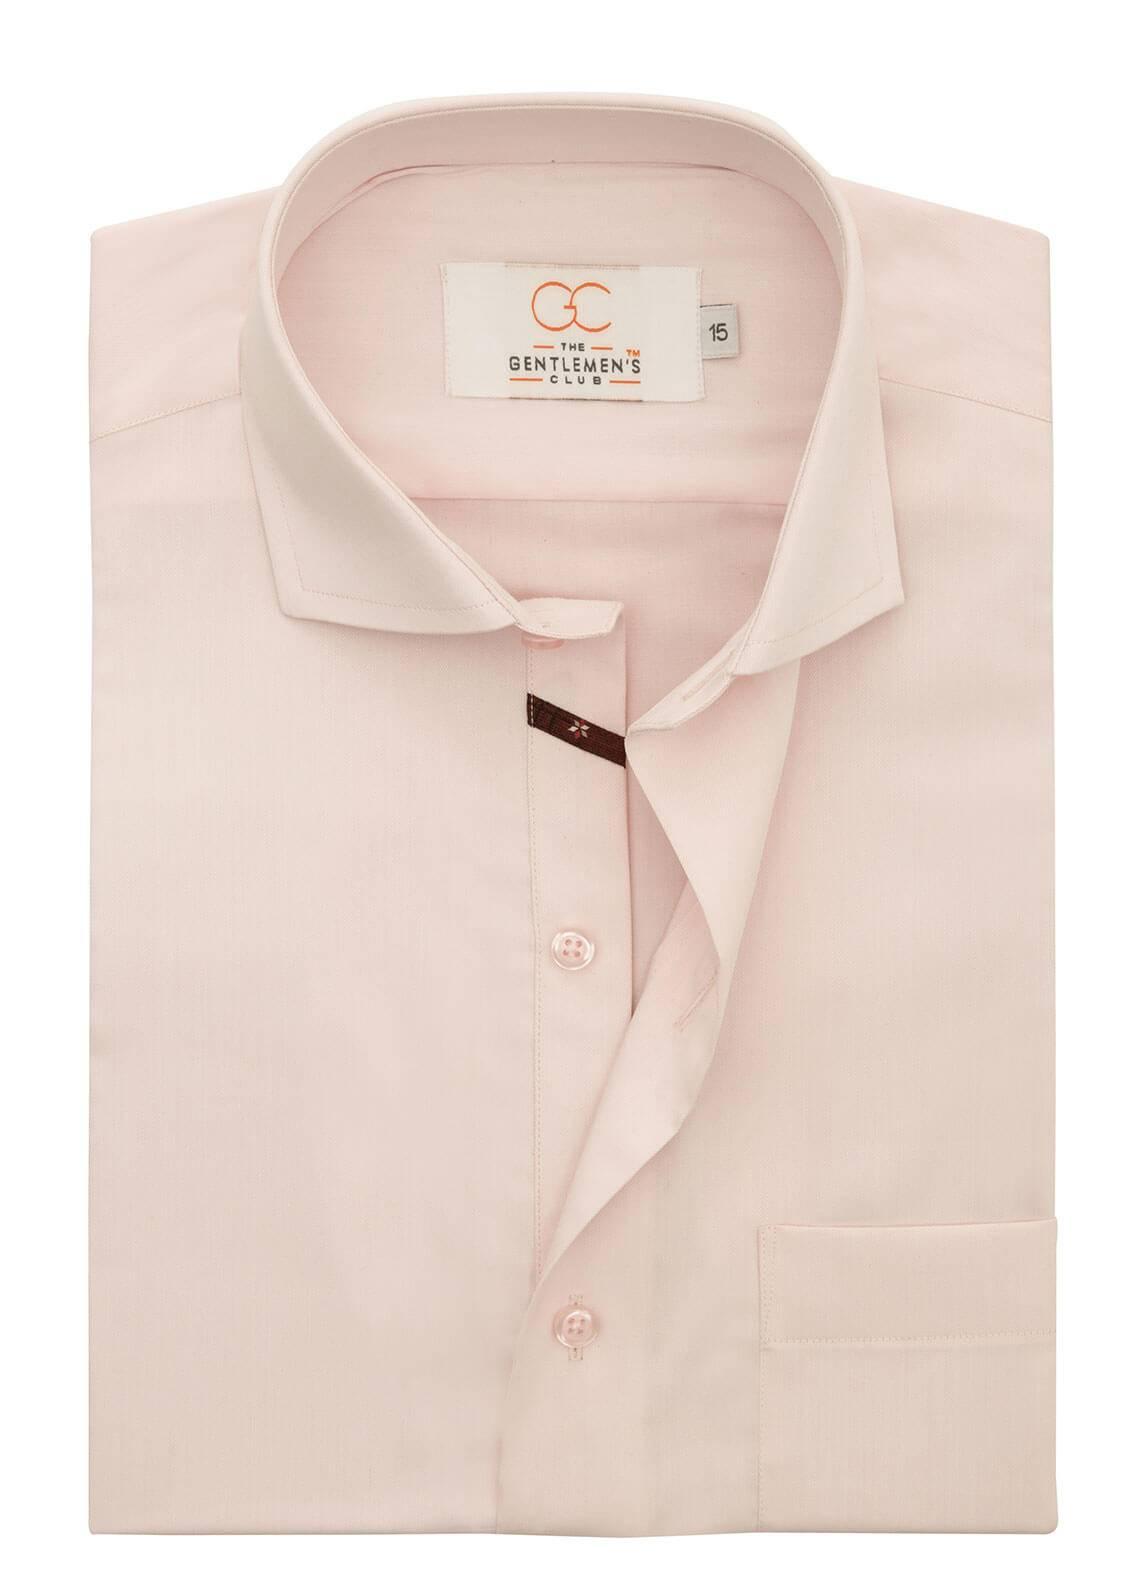 The Gentlemen's Club Cotton Formal Men Shirts - Pink White Label 4067 - 18.5